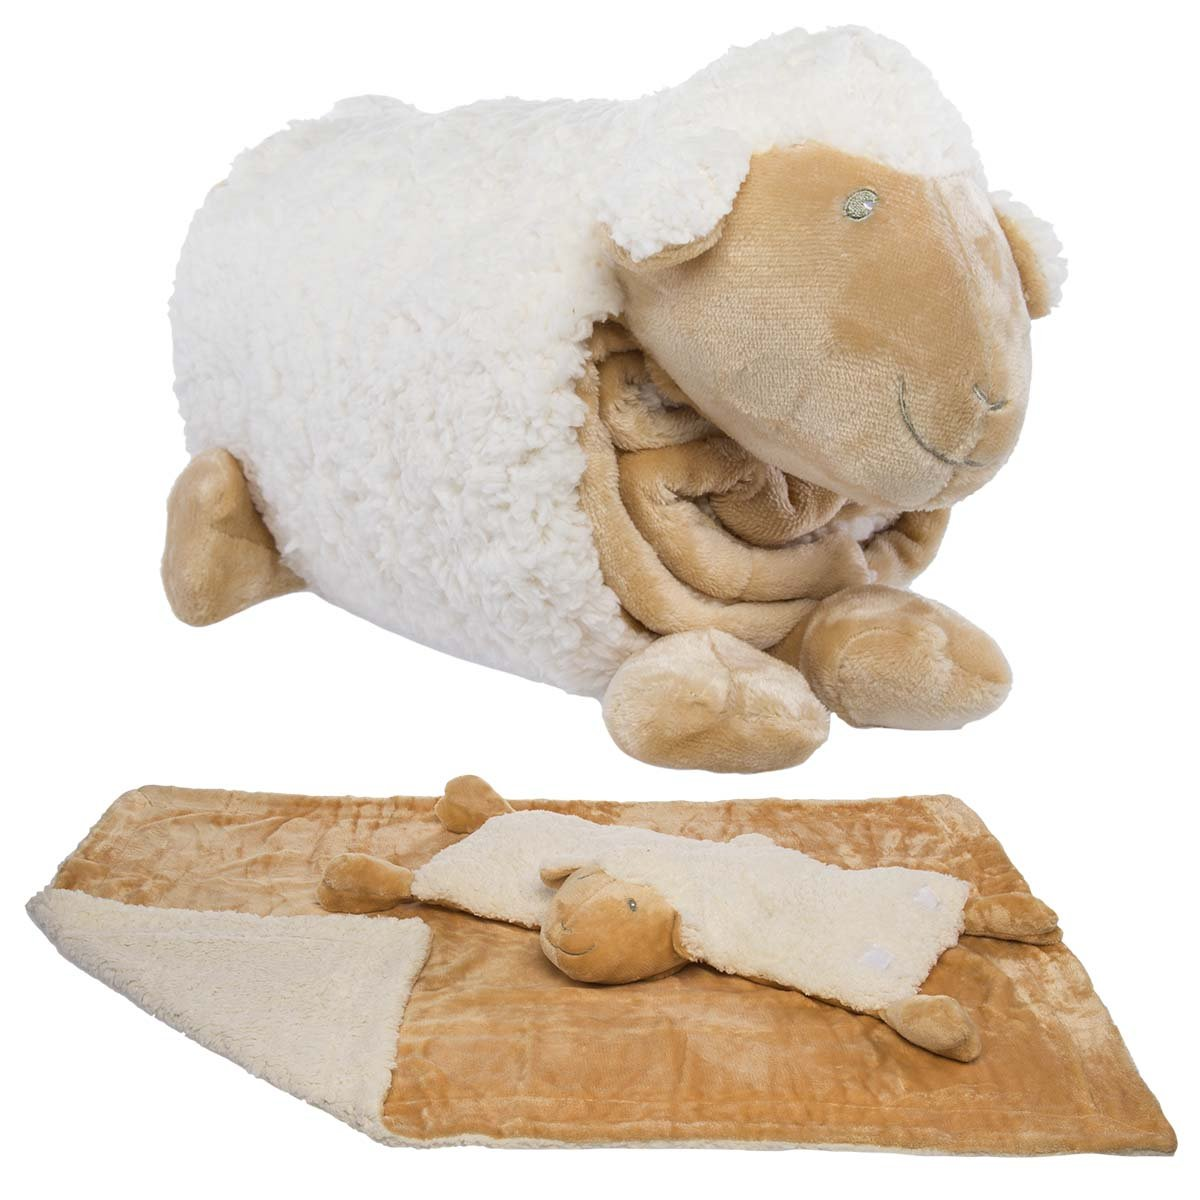 Amazon.com : Snuggle Me Sherpa Soft Baby Blanket & Plush